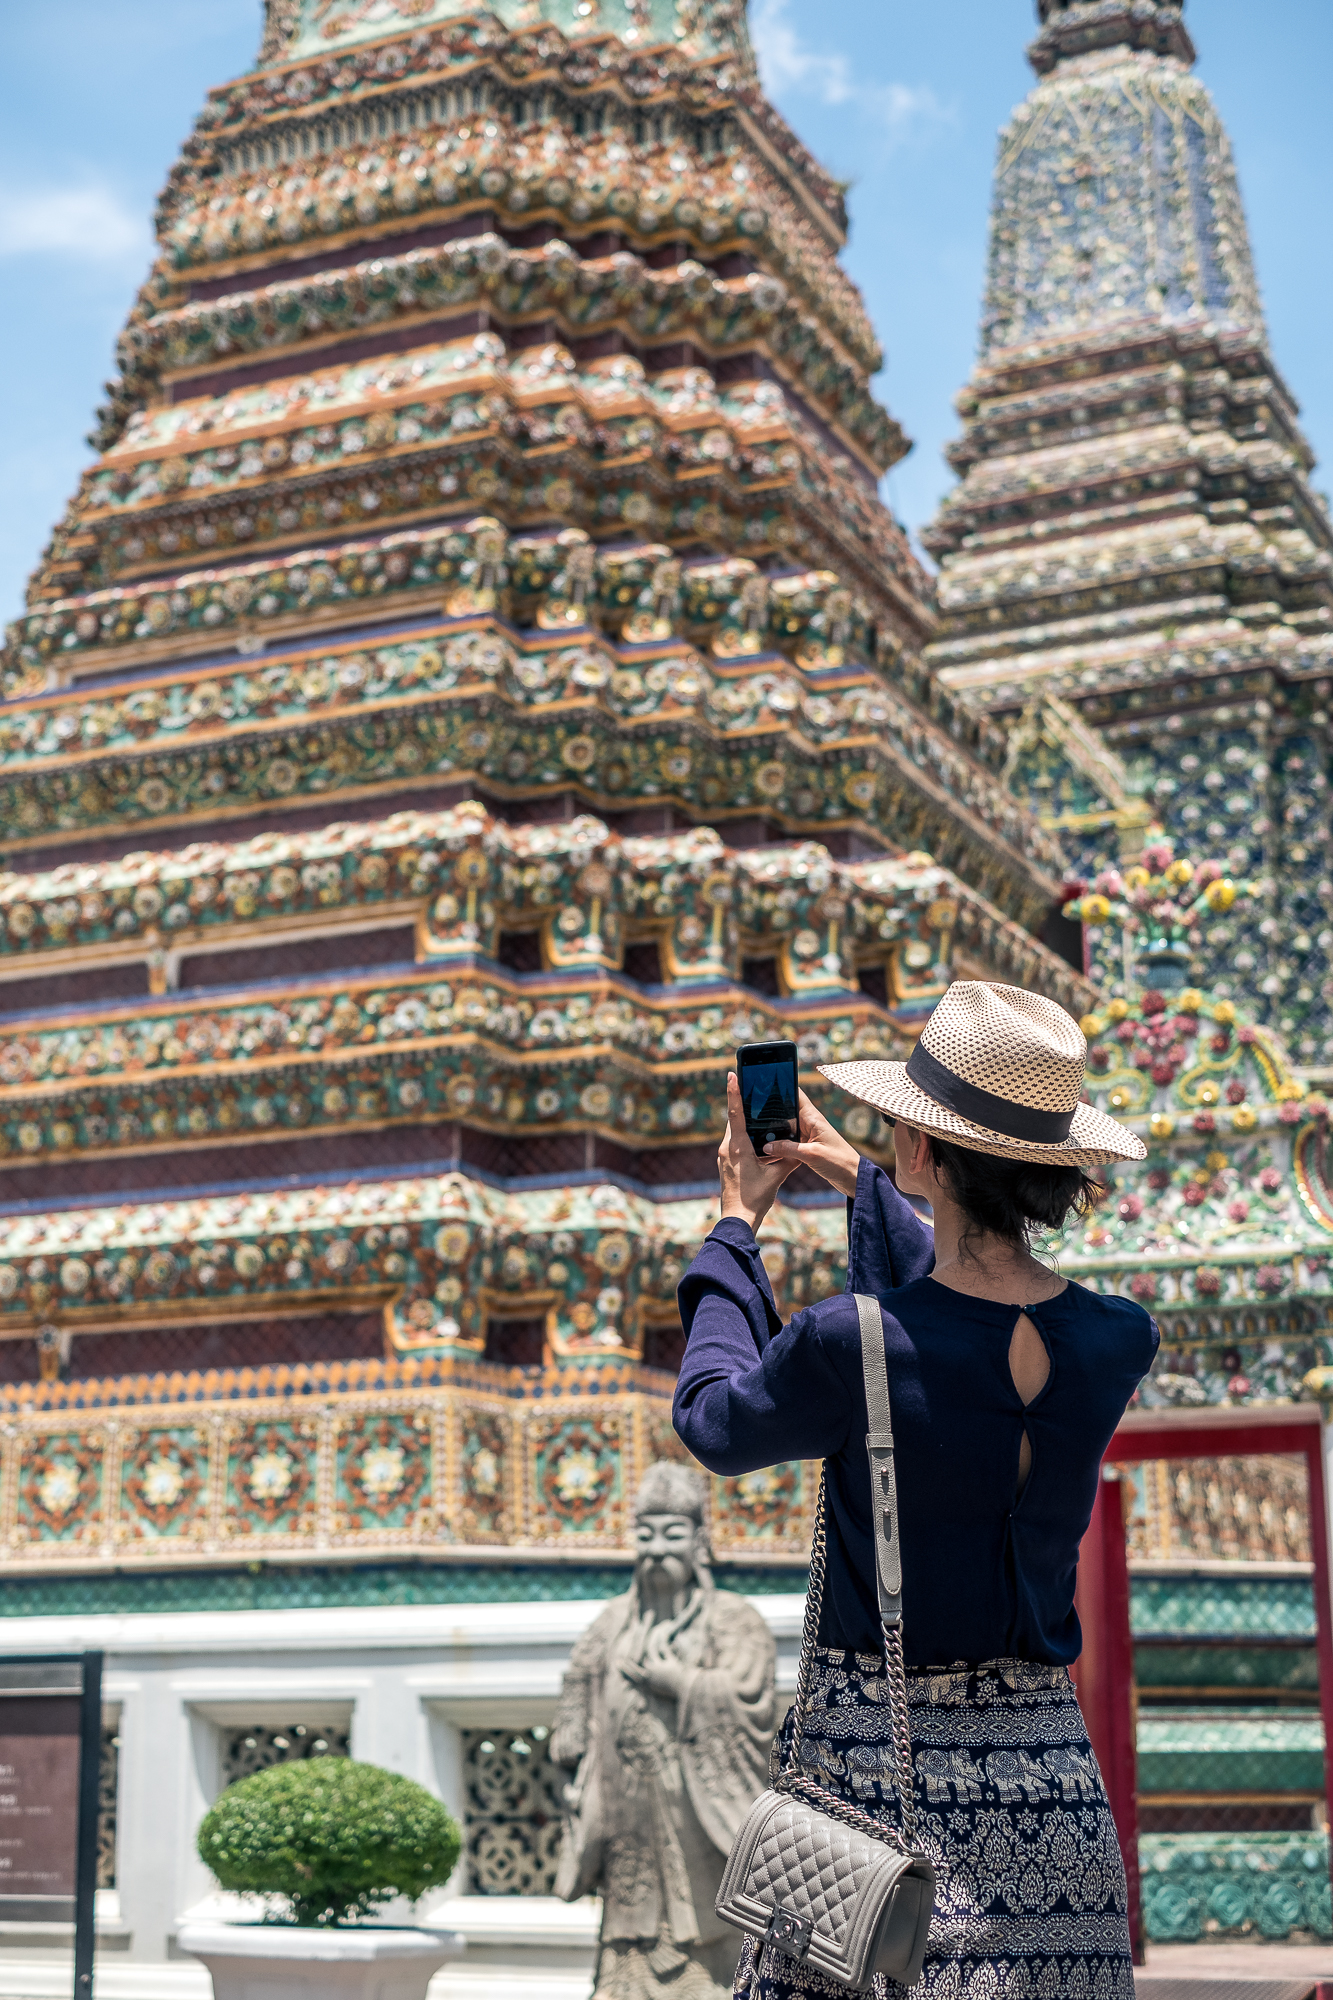 THAILAND_Honeymoon_TheOutsiderBlog_DSCF0241.JPG